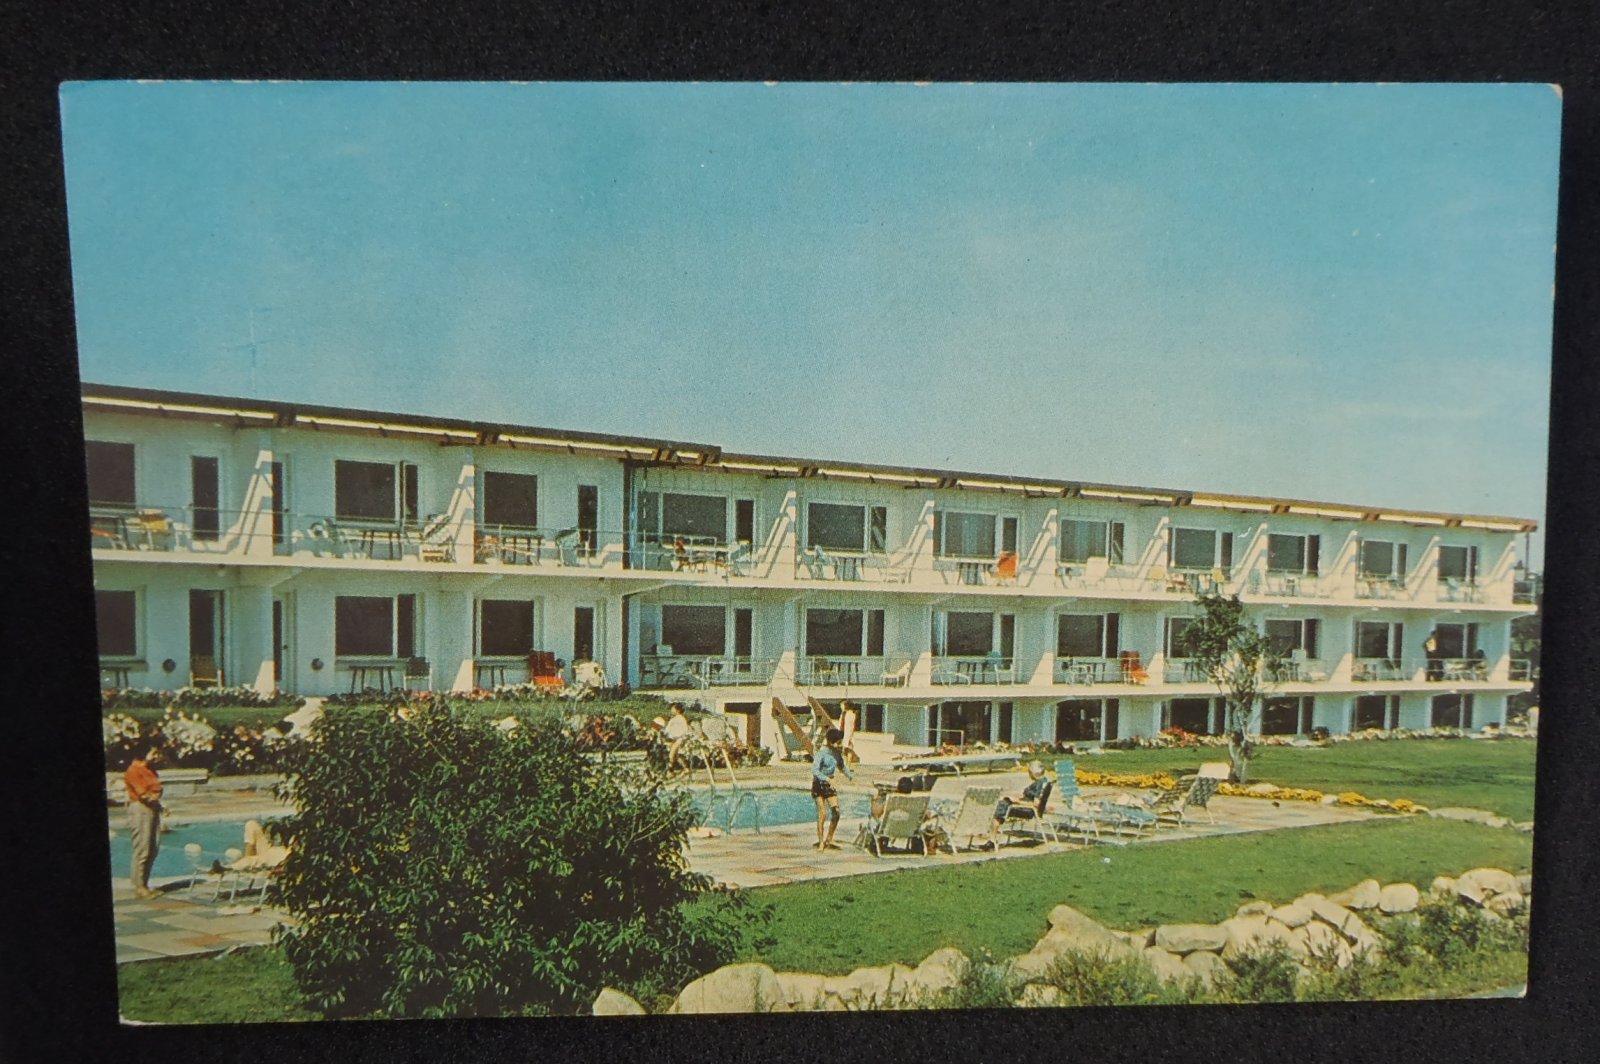 1960s atlantis motor inn gloucester ma essex co postcard